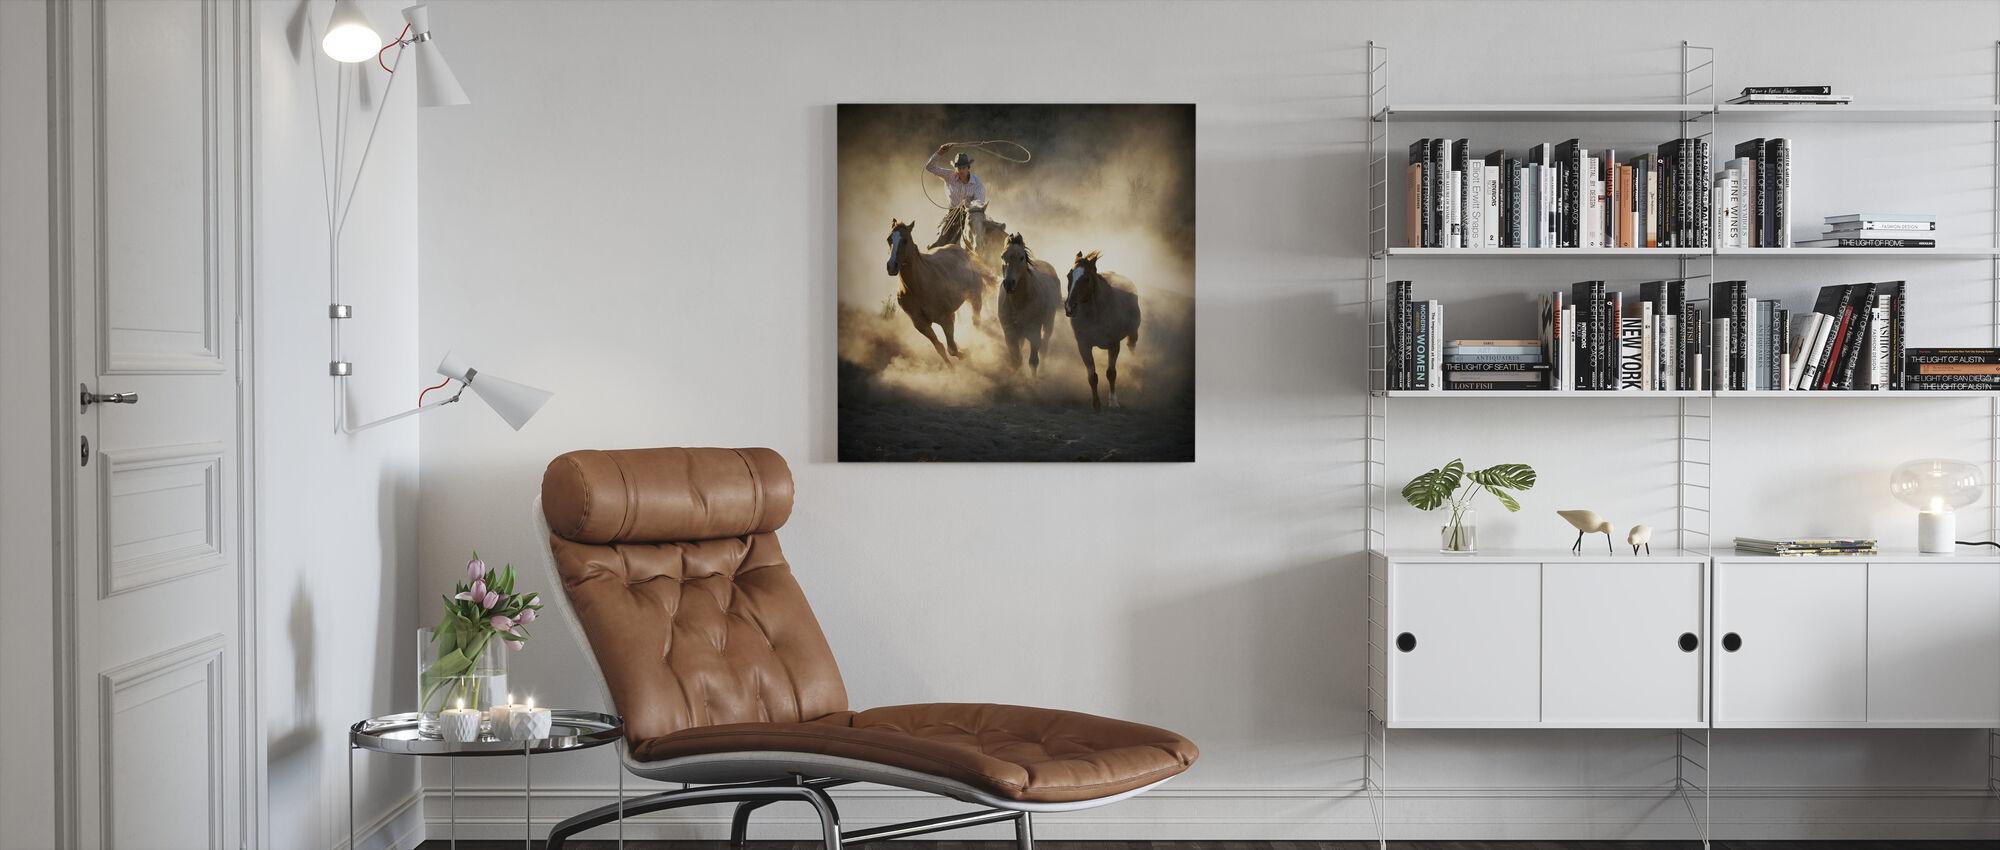 Roundup - Canvas print - Living Room